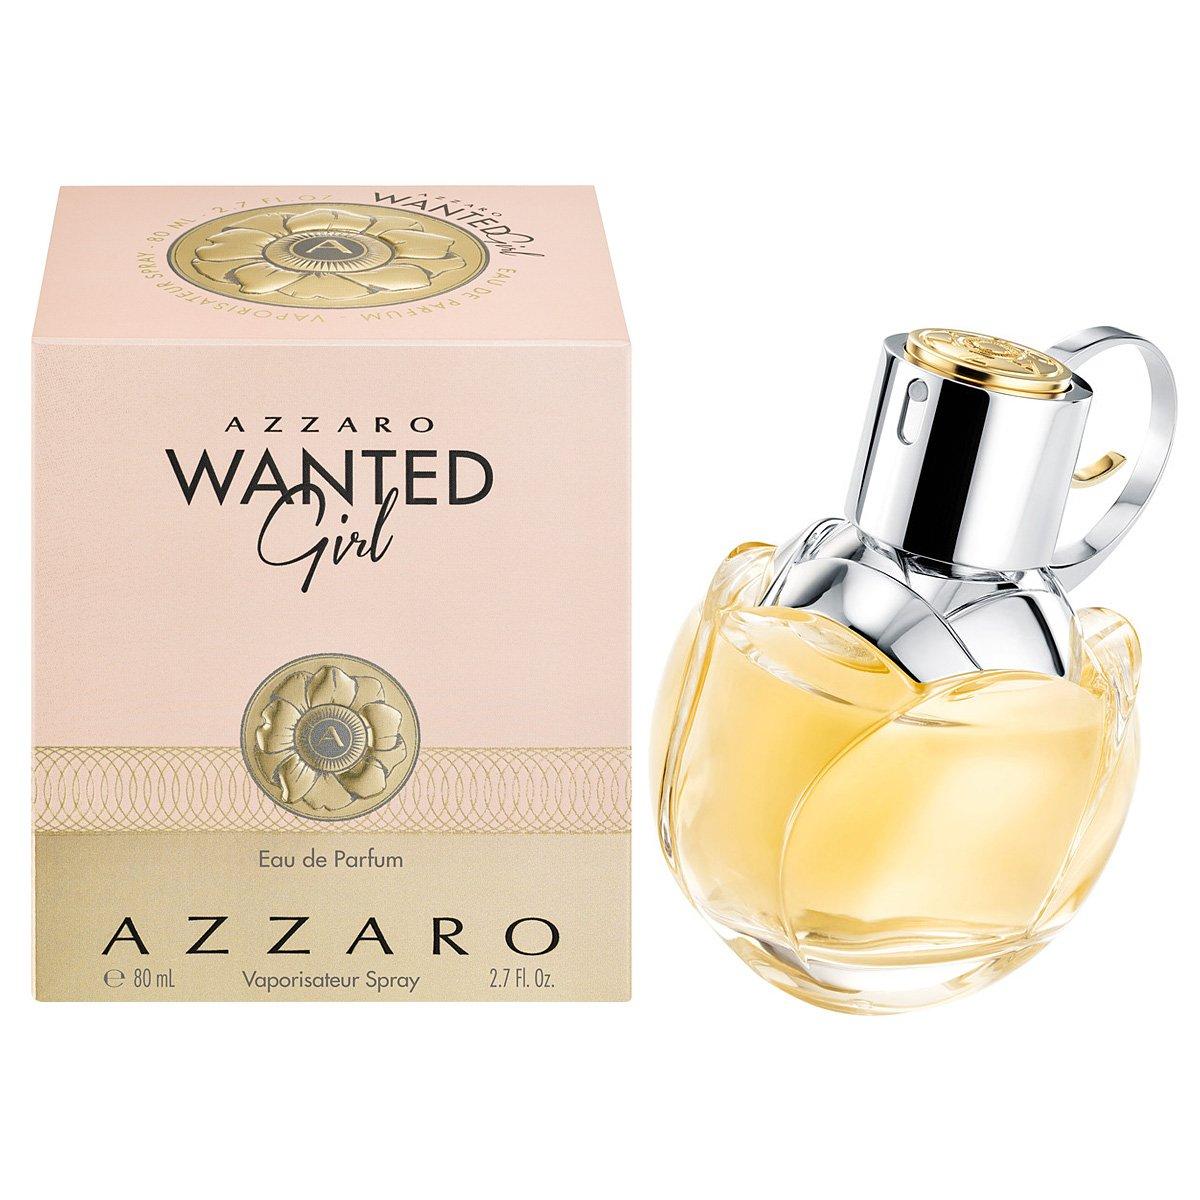 парфюмерия Azzaro магазин парфюмерии в минске парфюм минск